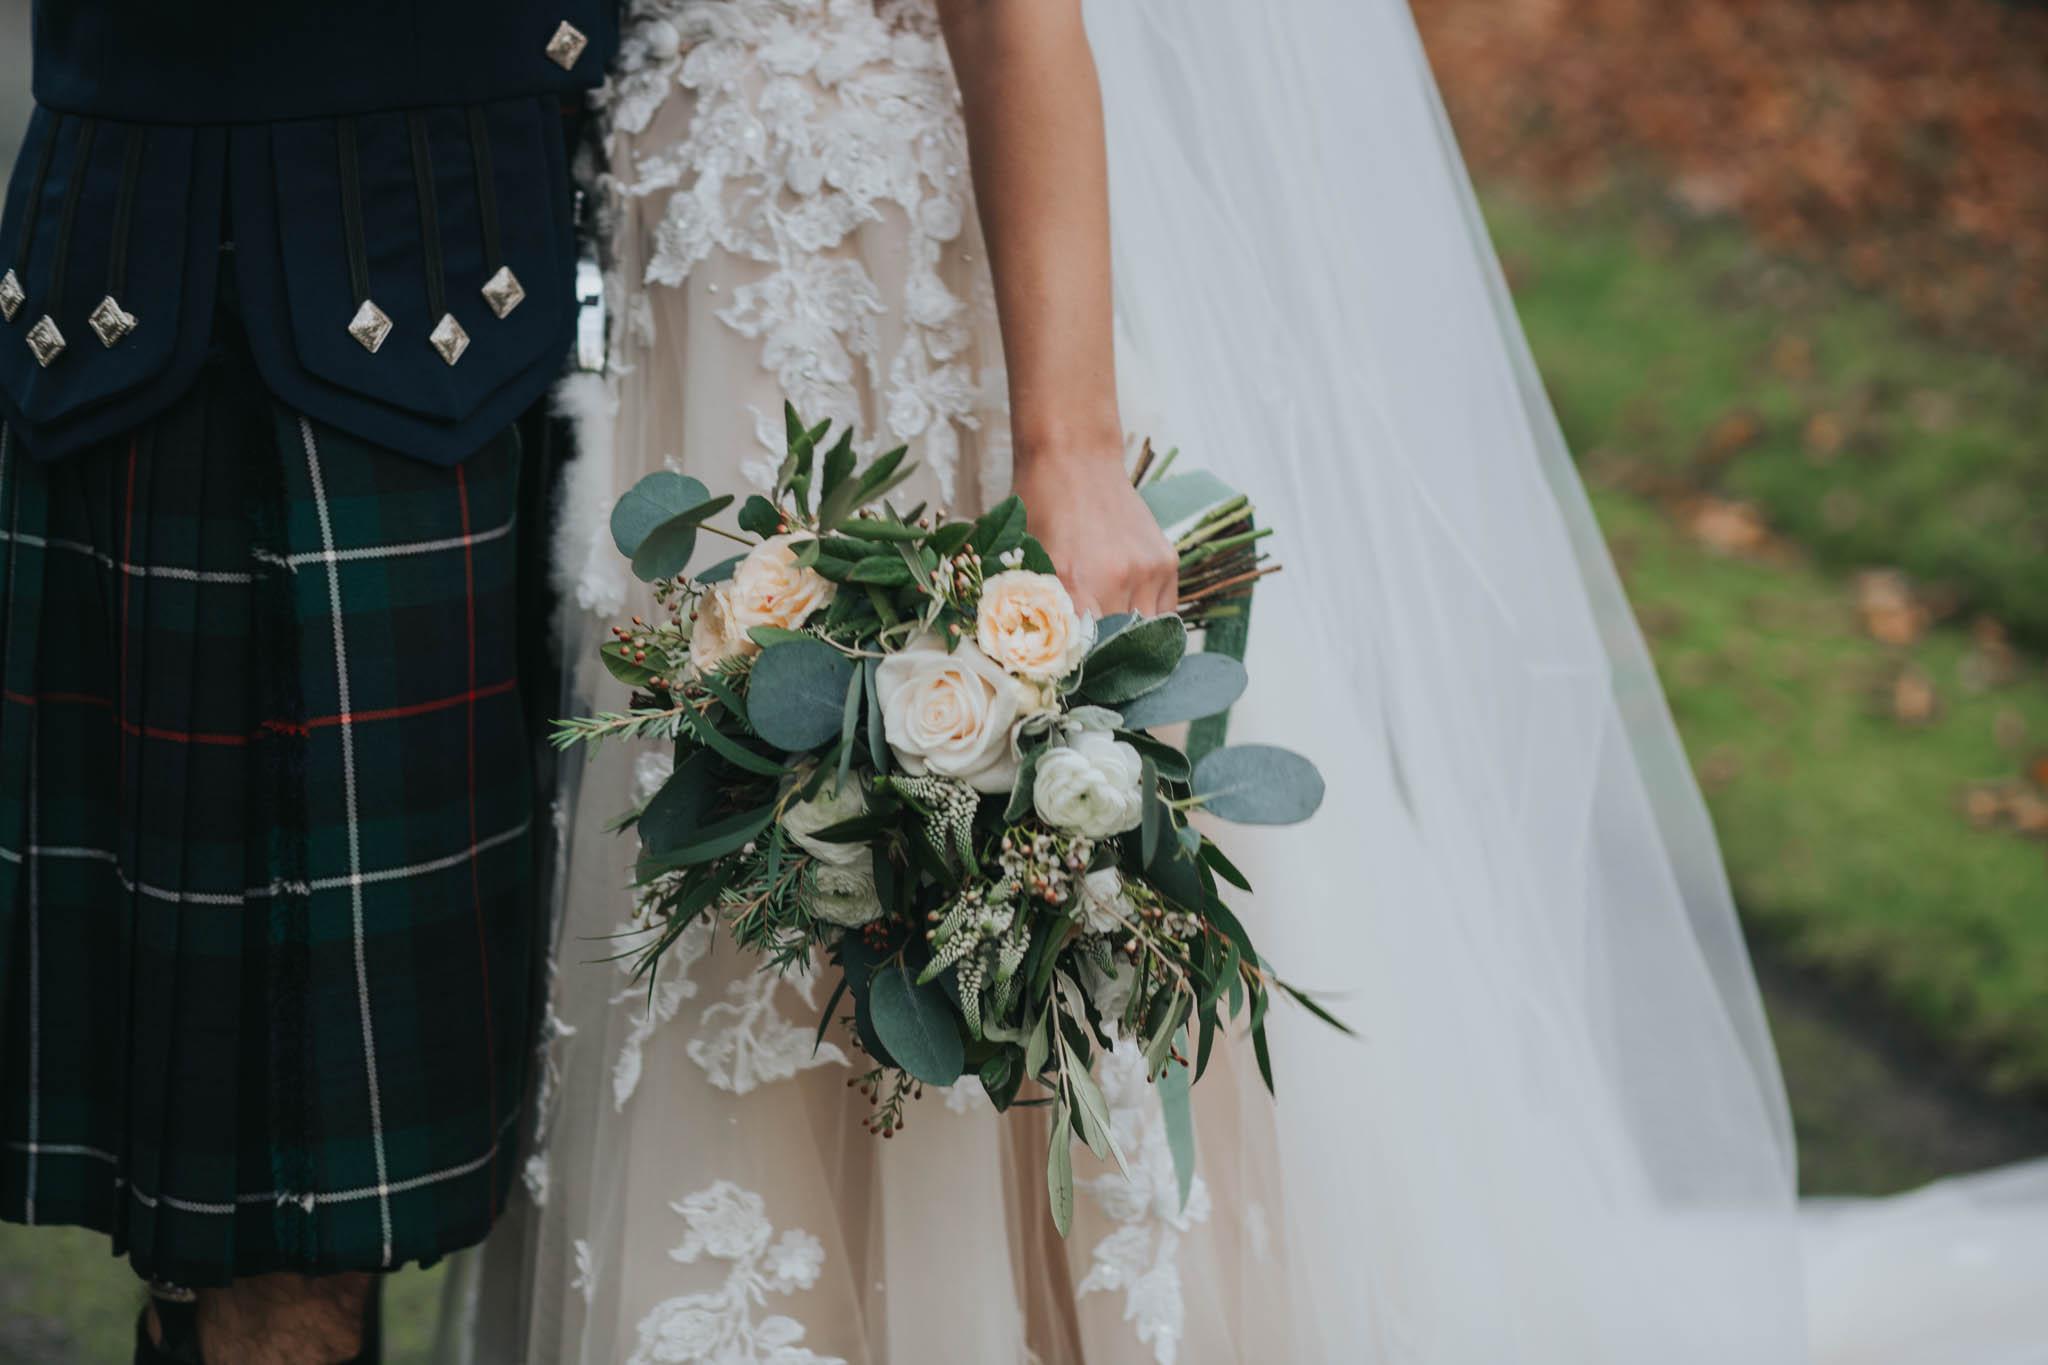 Soft whites, creams & foliage for this bride | Jen Owens Images.